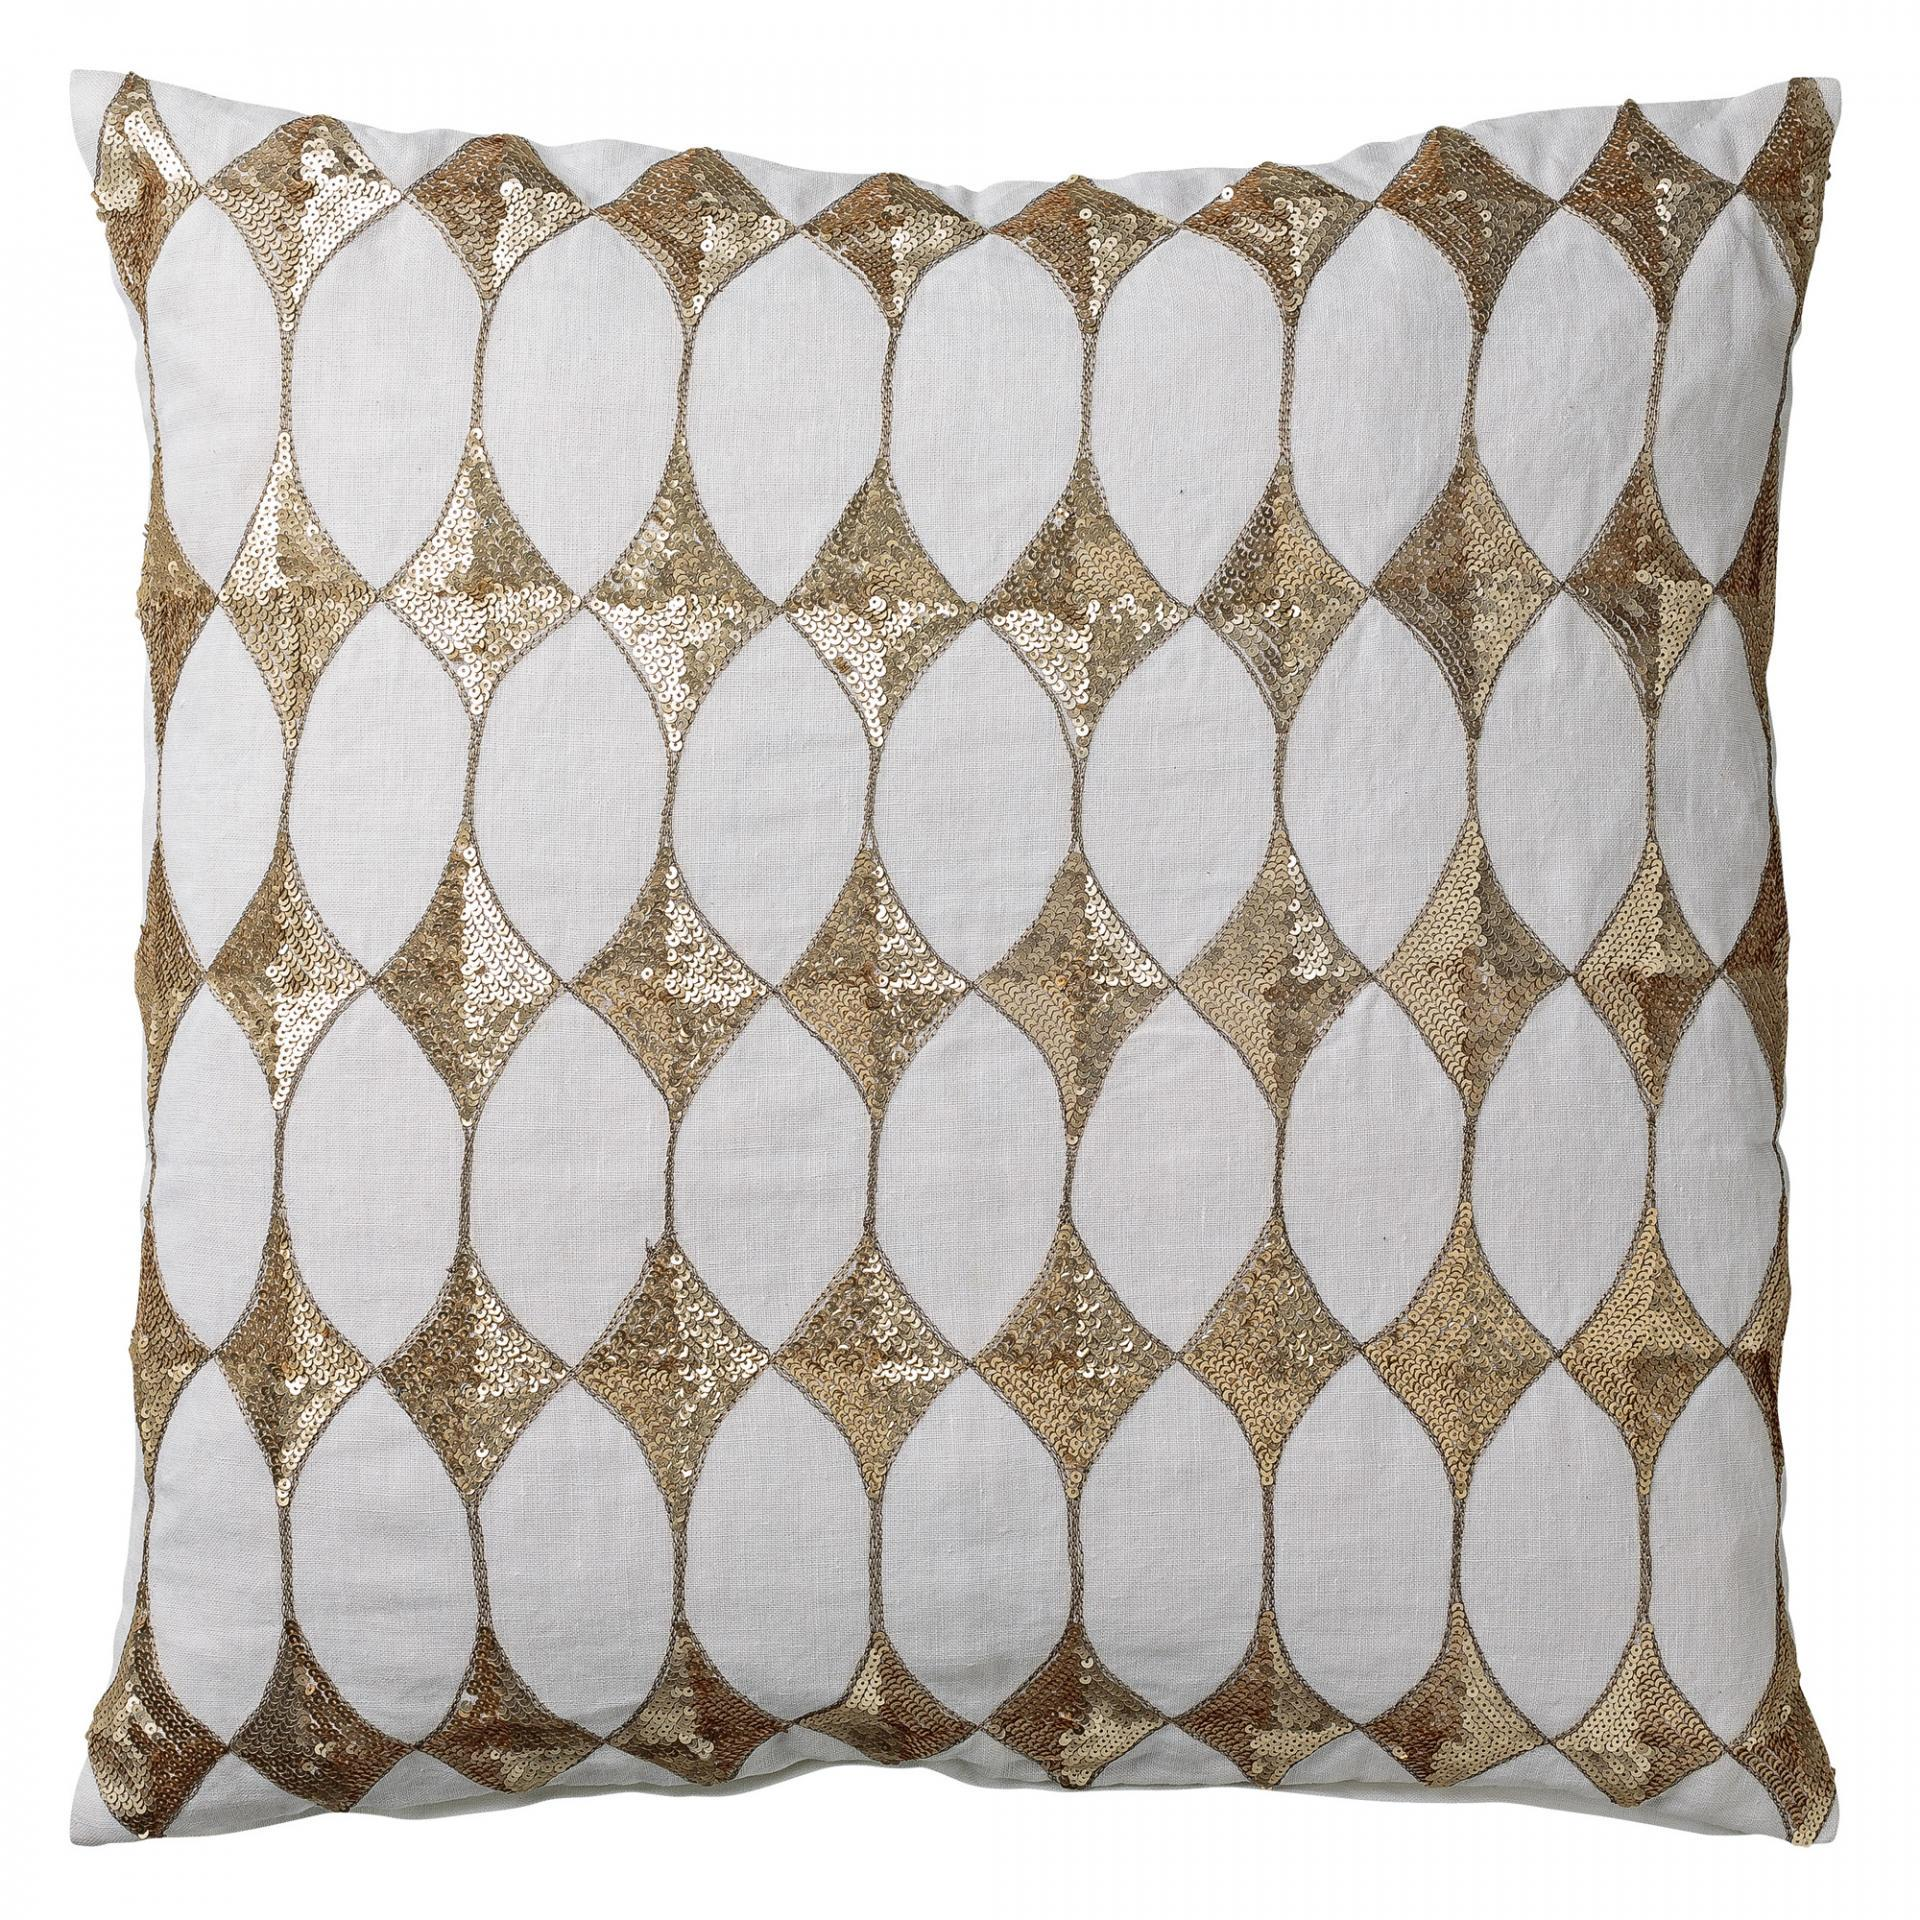 Lněný povlak na polštář Harlequin White 50x50 cm, bílá barva, zlatá barva, textil